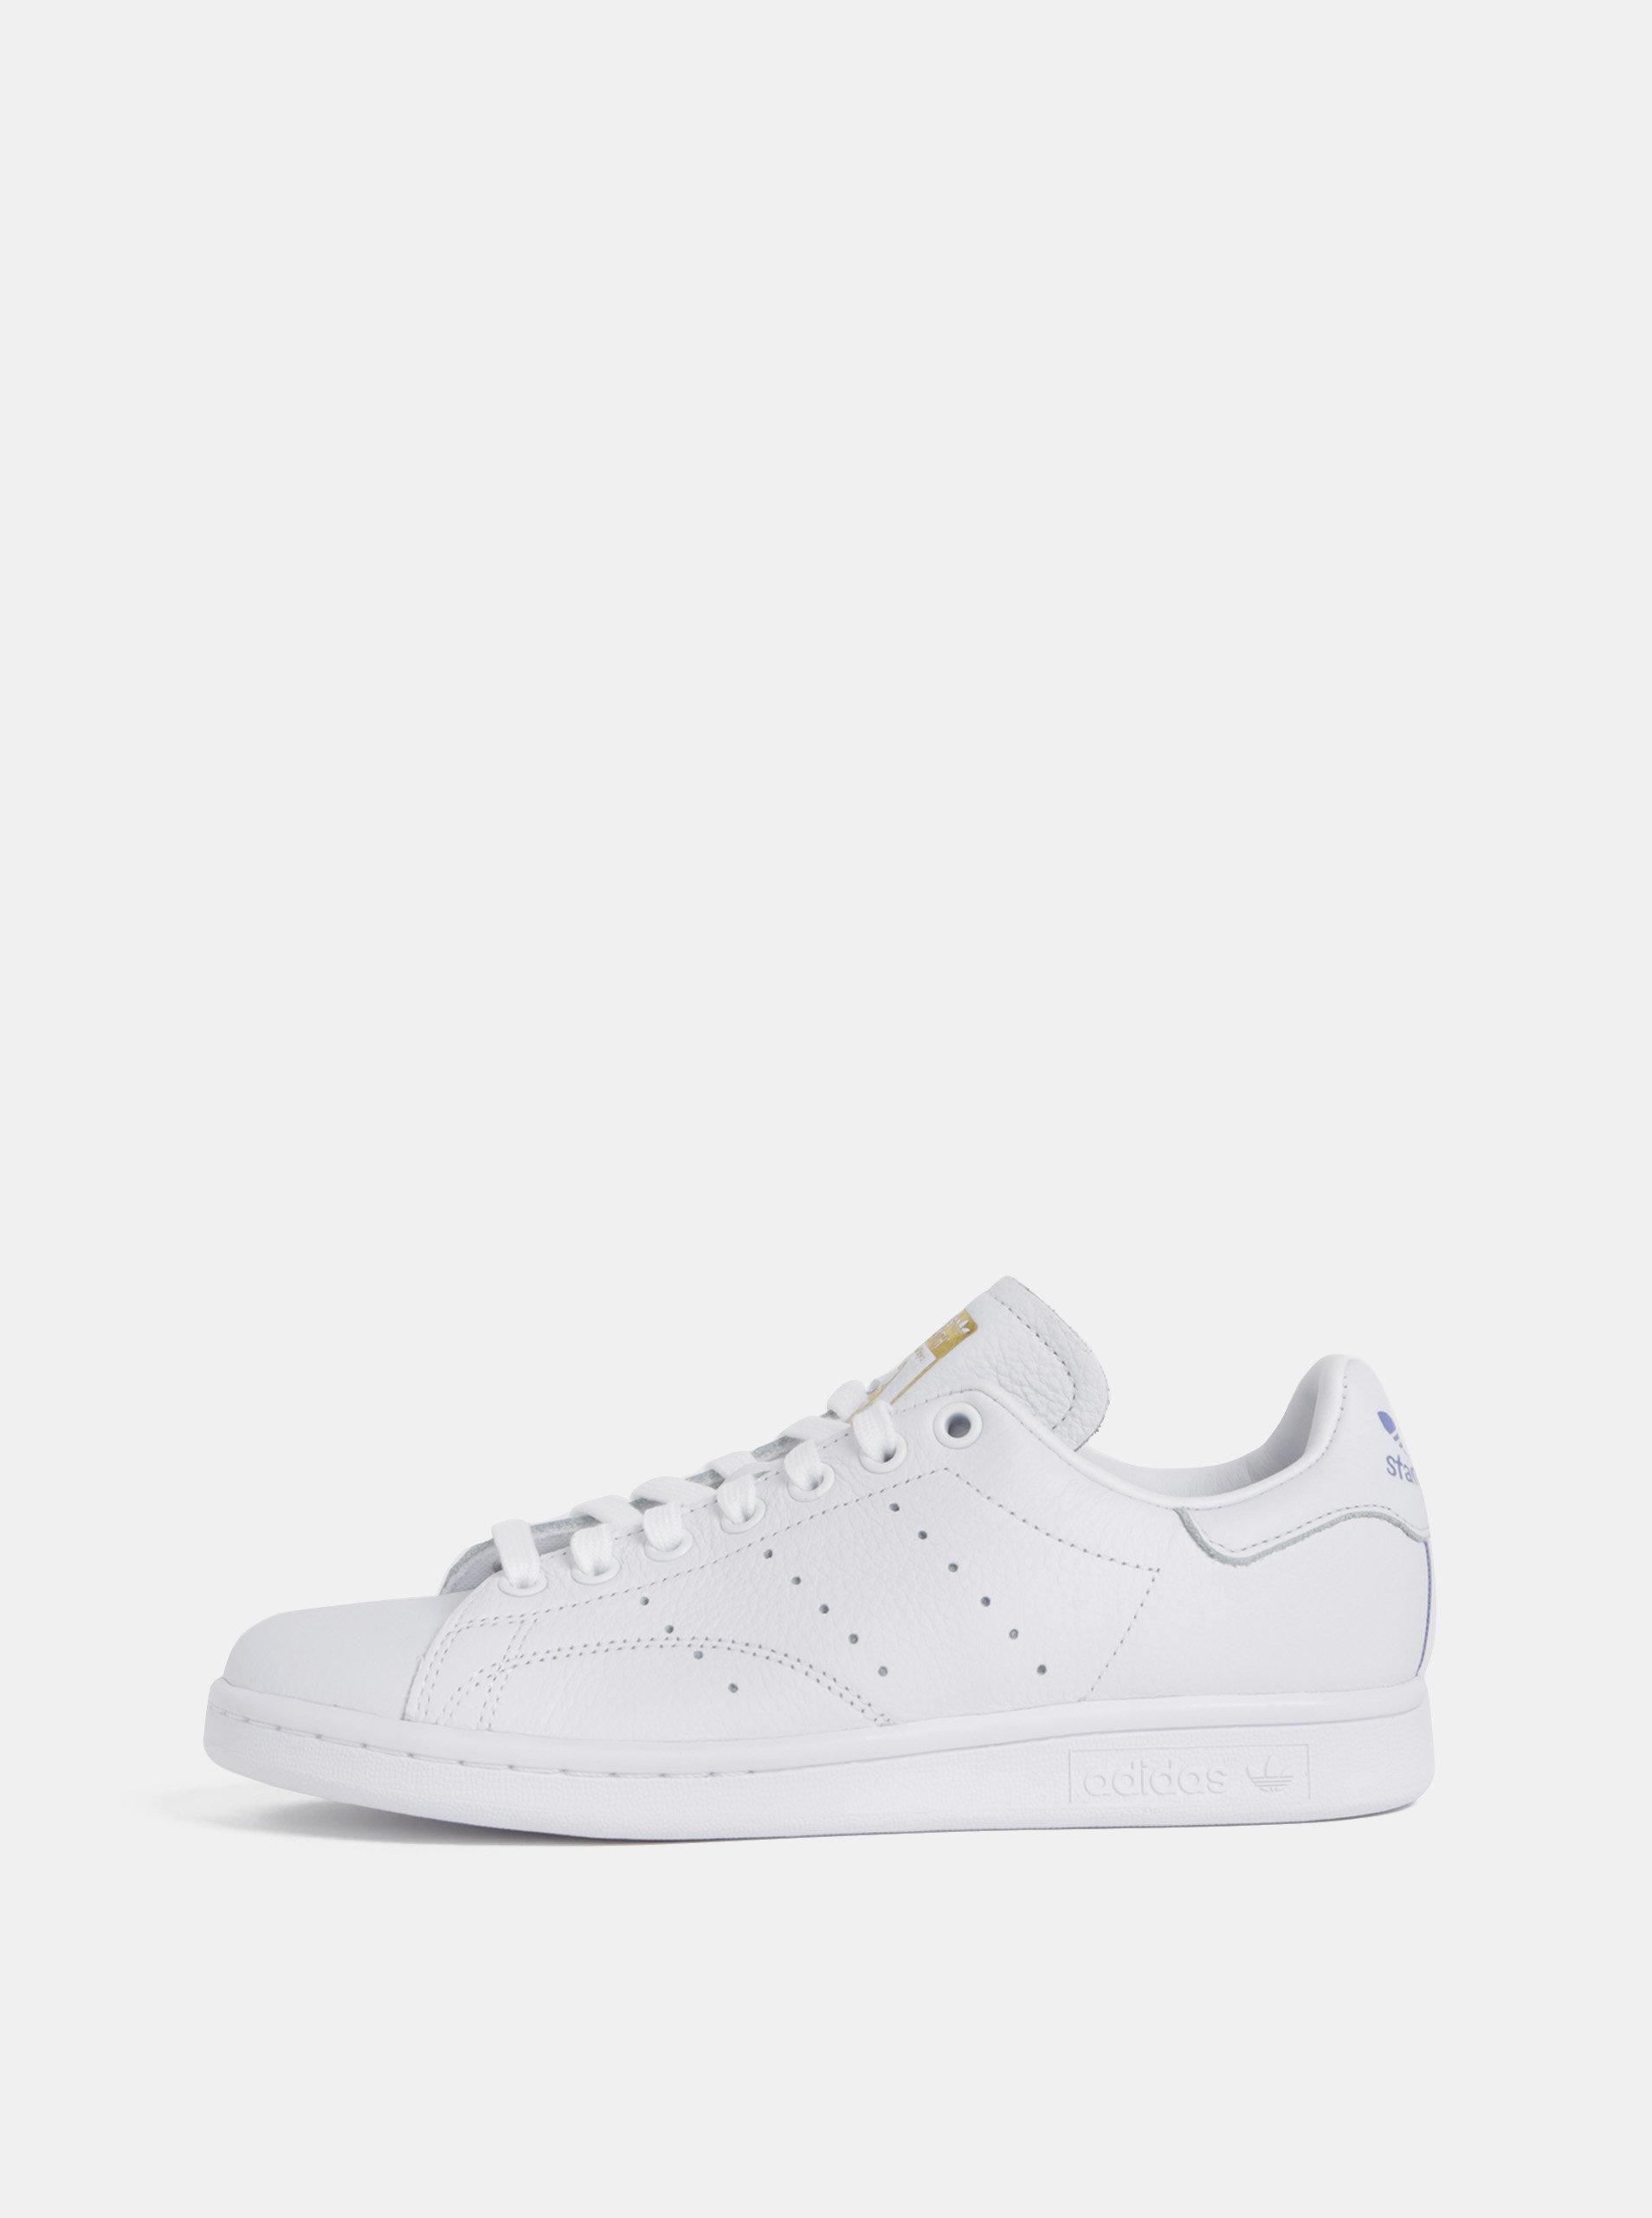 09f00d292e Biele dámske kožené tenisky adidas Originals Stan Smith ...